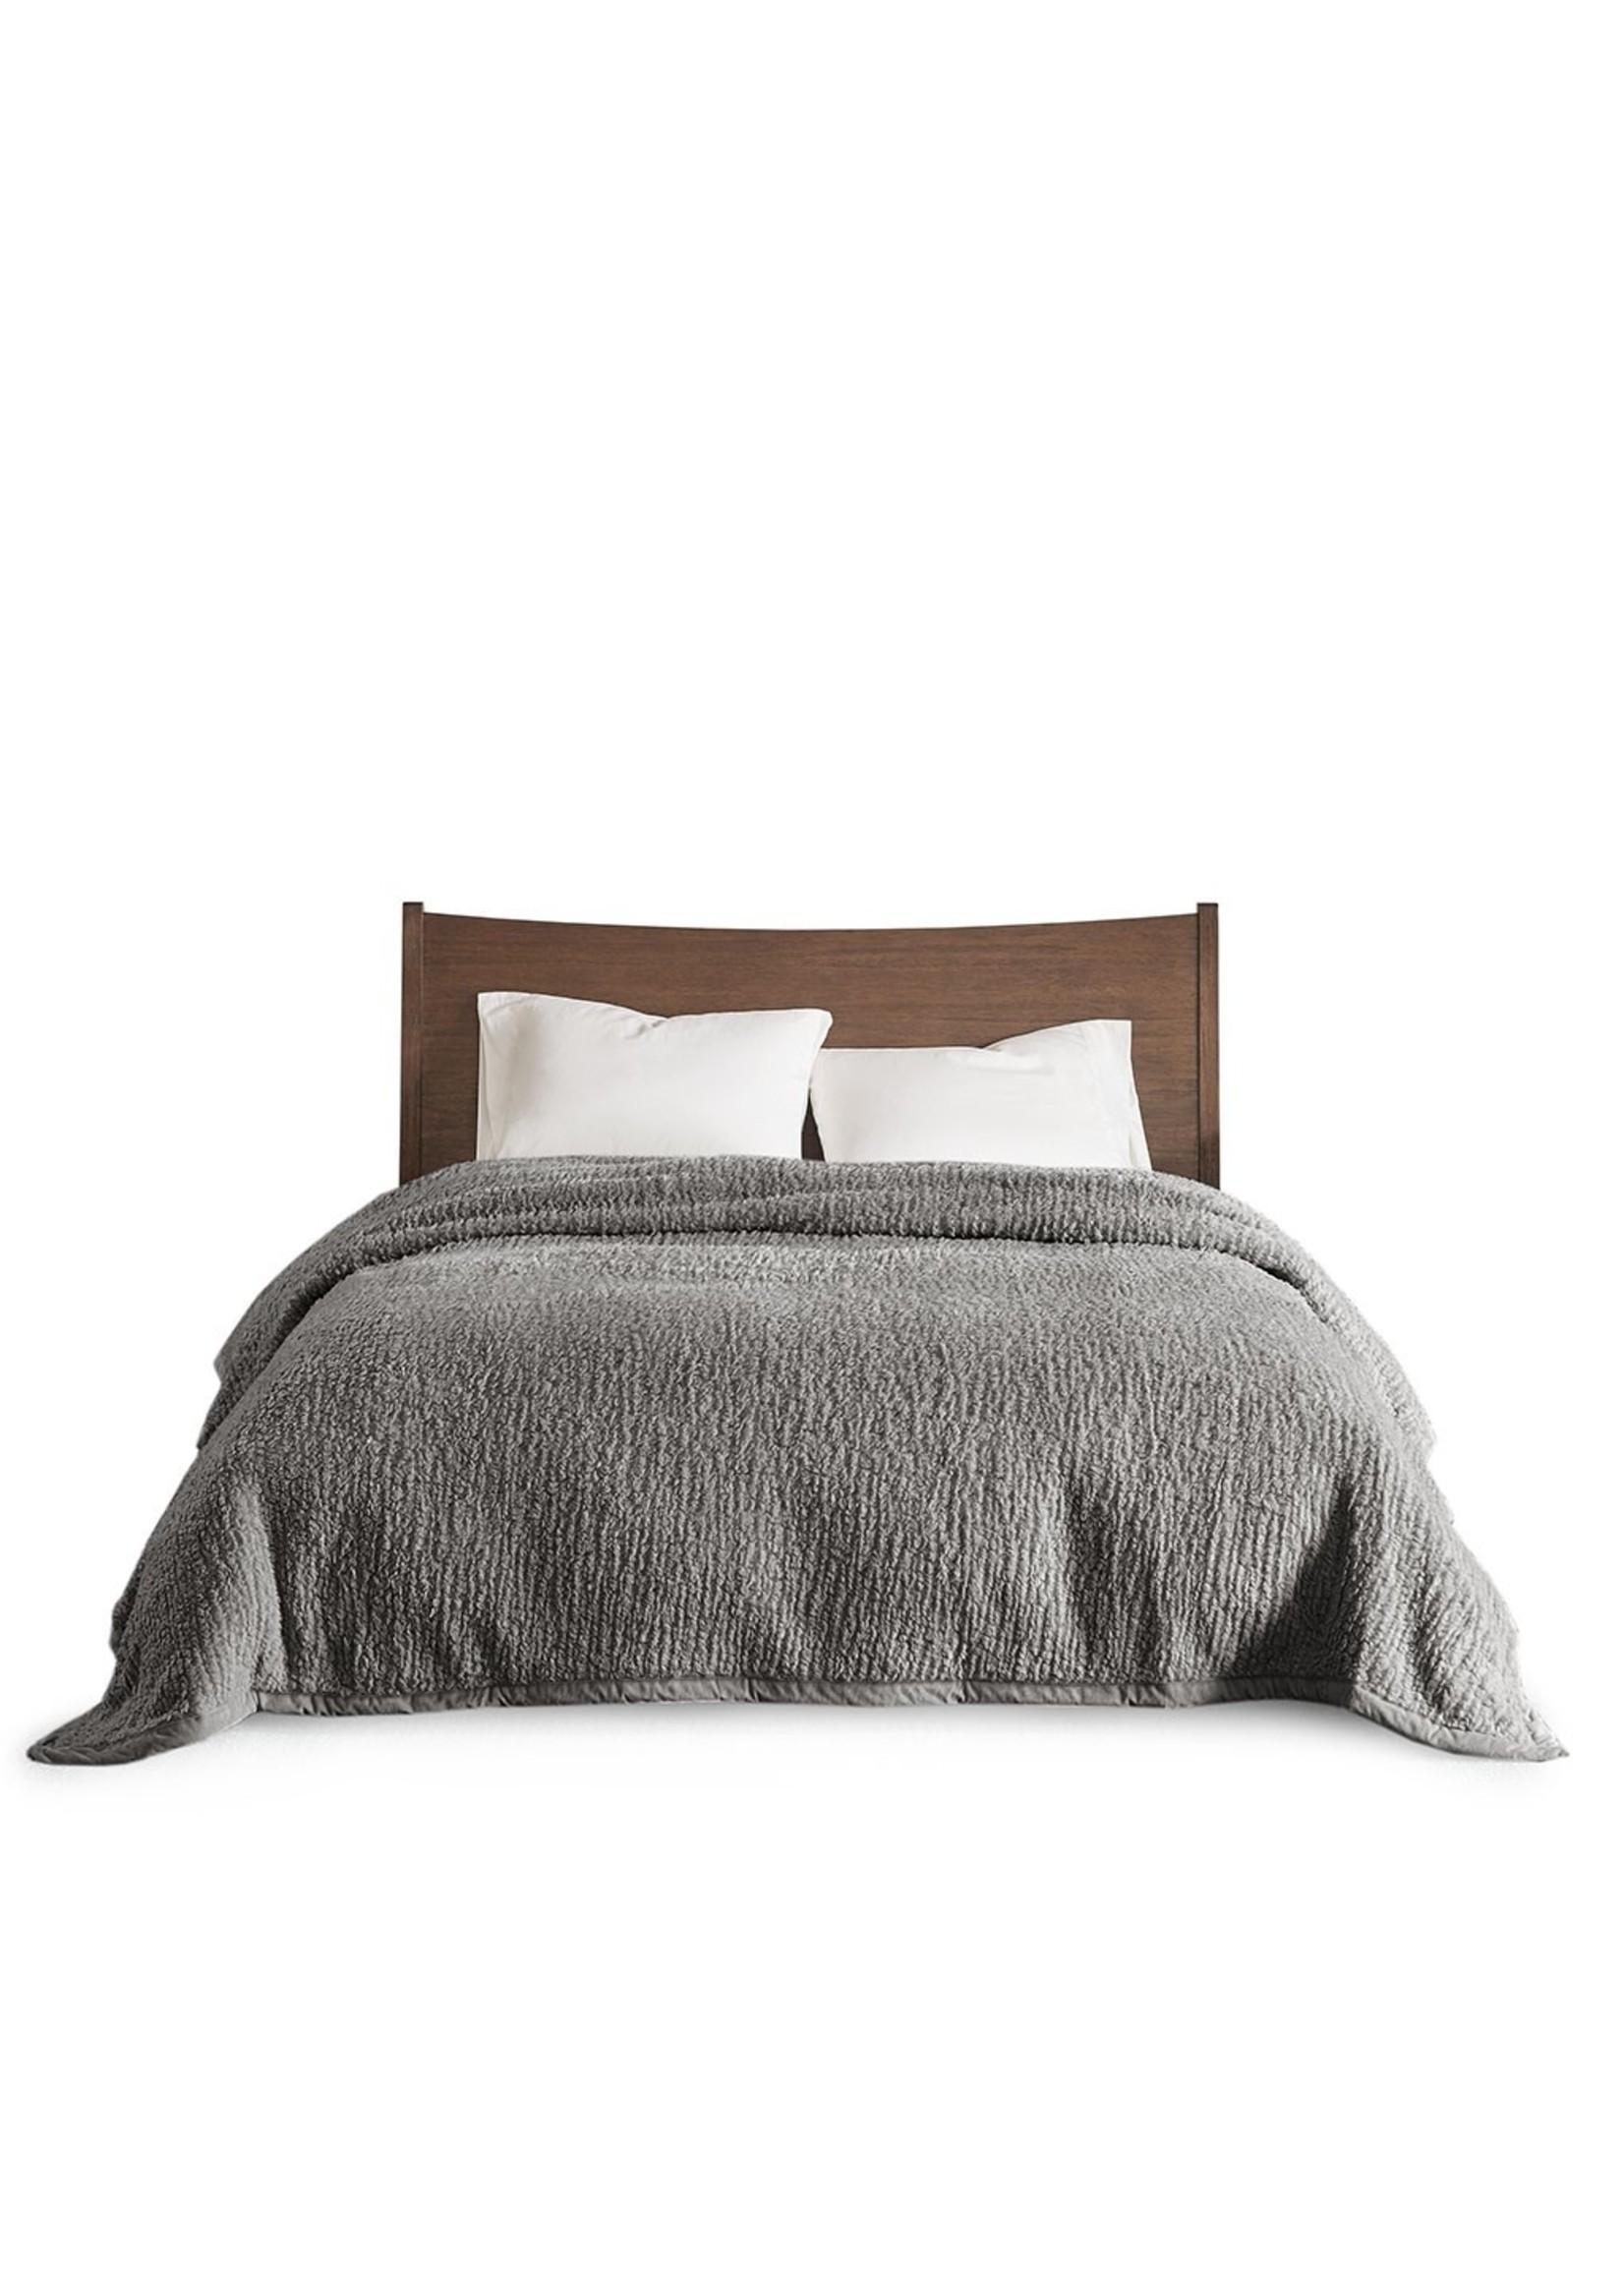 Olliix Grey Sherpa Blanket - King